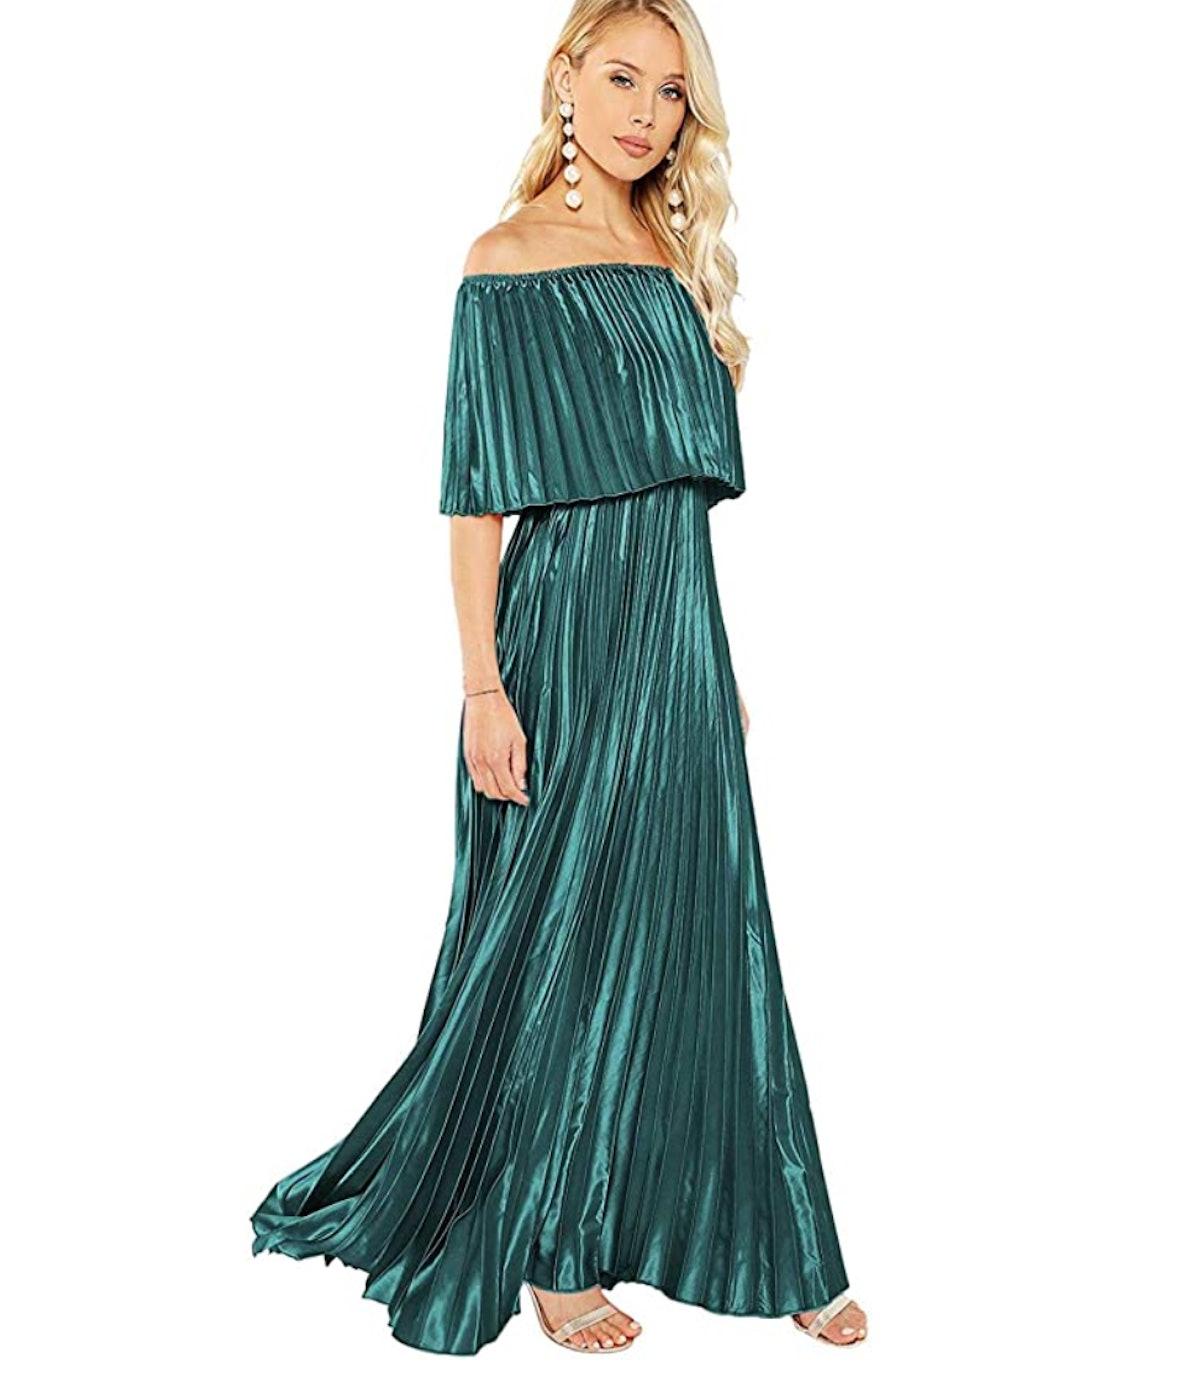 Milumia Maxi Dress